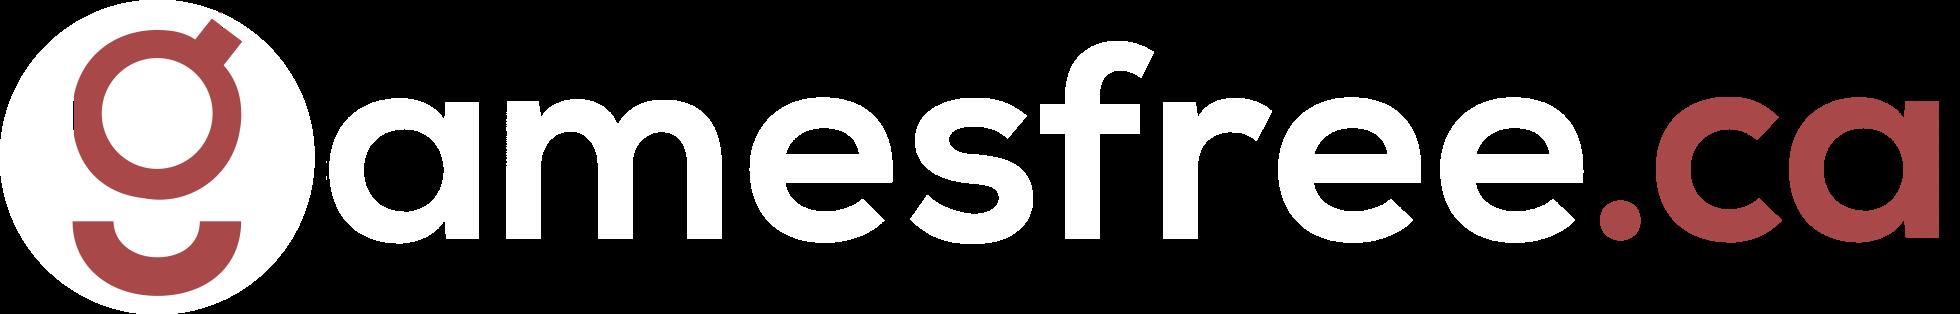 GamesFree.ca Logo